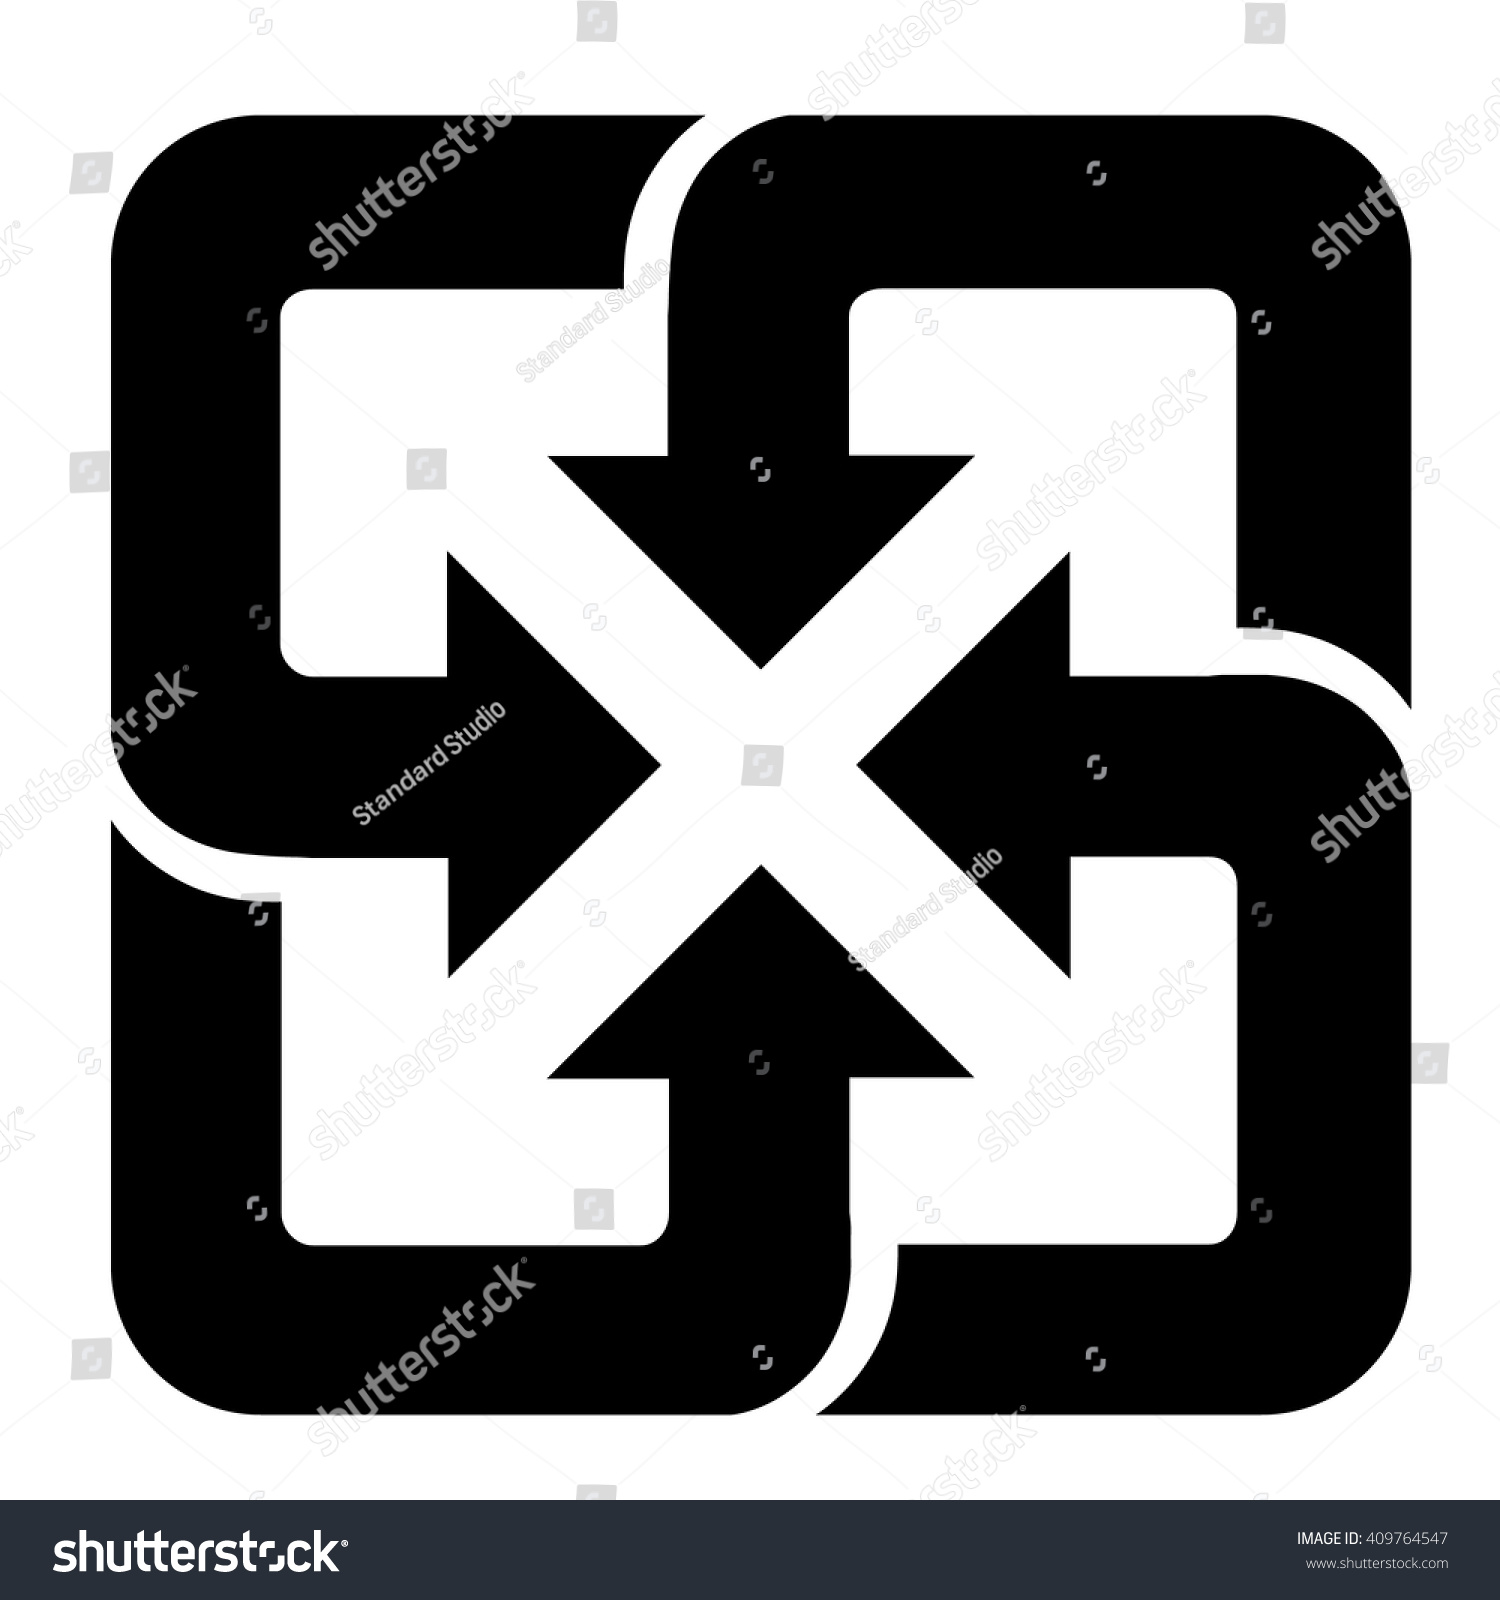 Taiwan recycling symbol isolated black sign stock vector 409764547 taiwan recycling symbol isolated black sign on white background vector illustration buycottarizona Choice Image